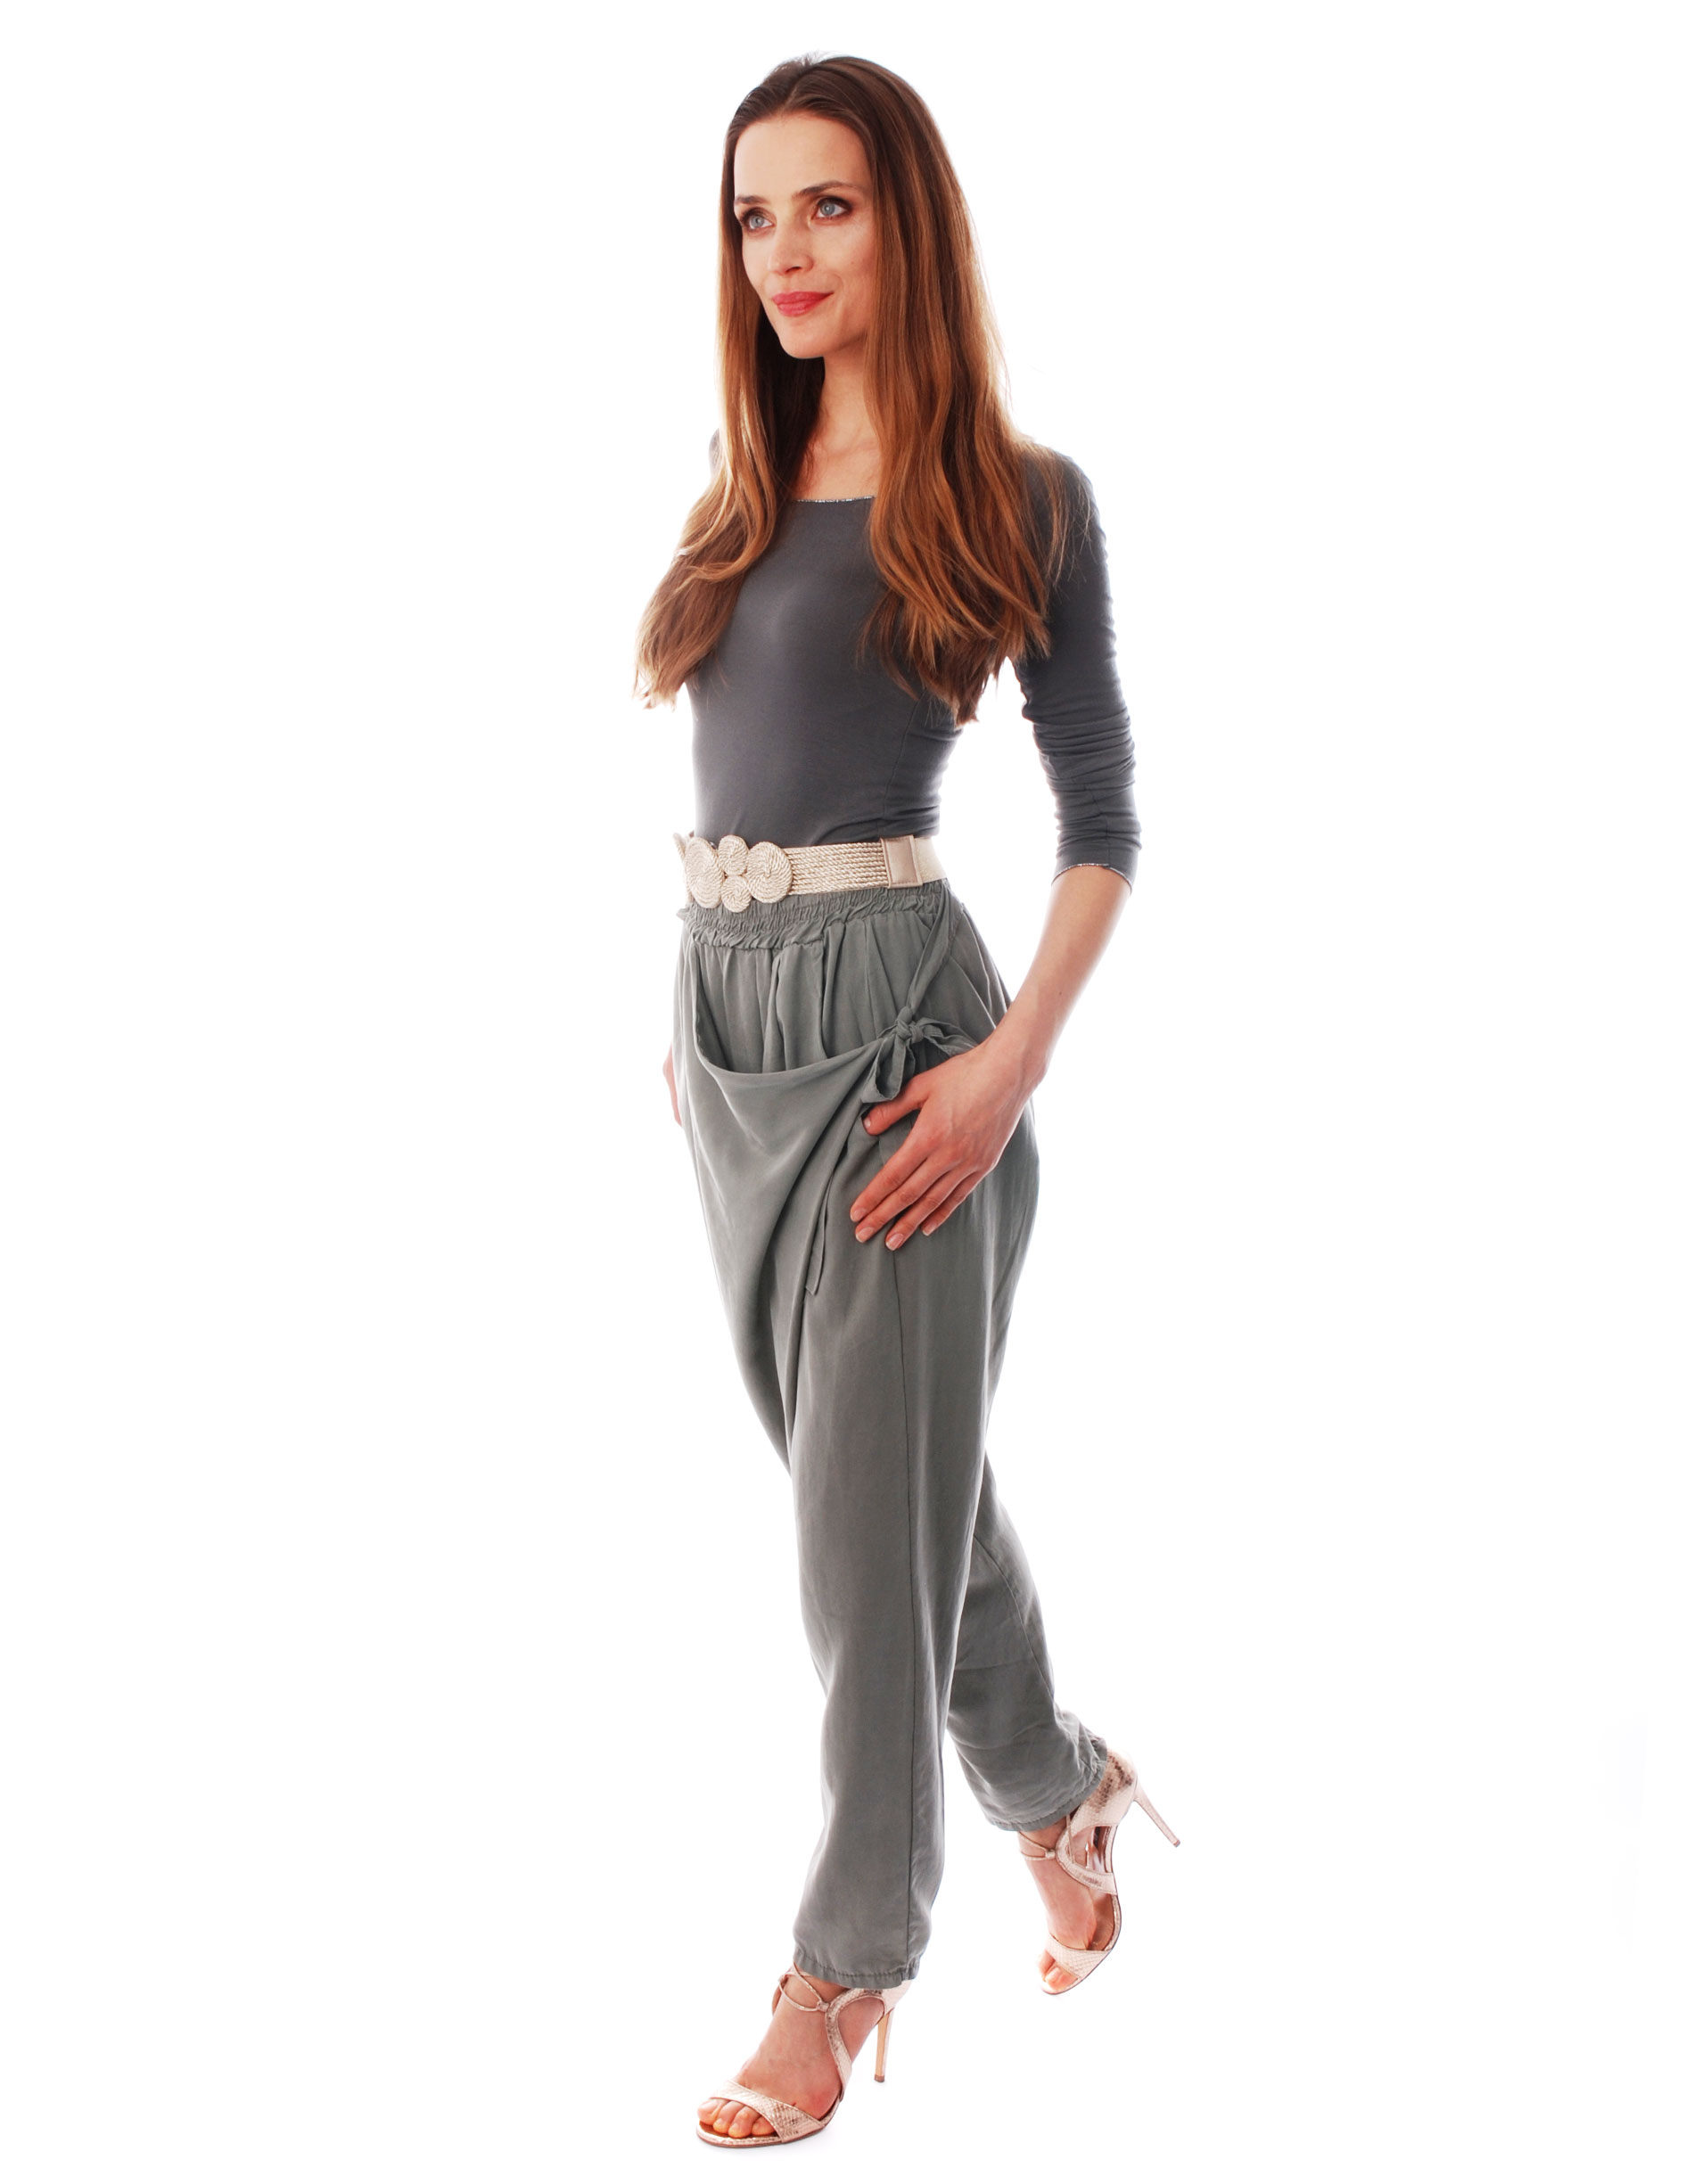 Spodnie - 114-2040 MILI - Unisono